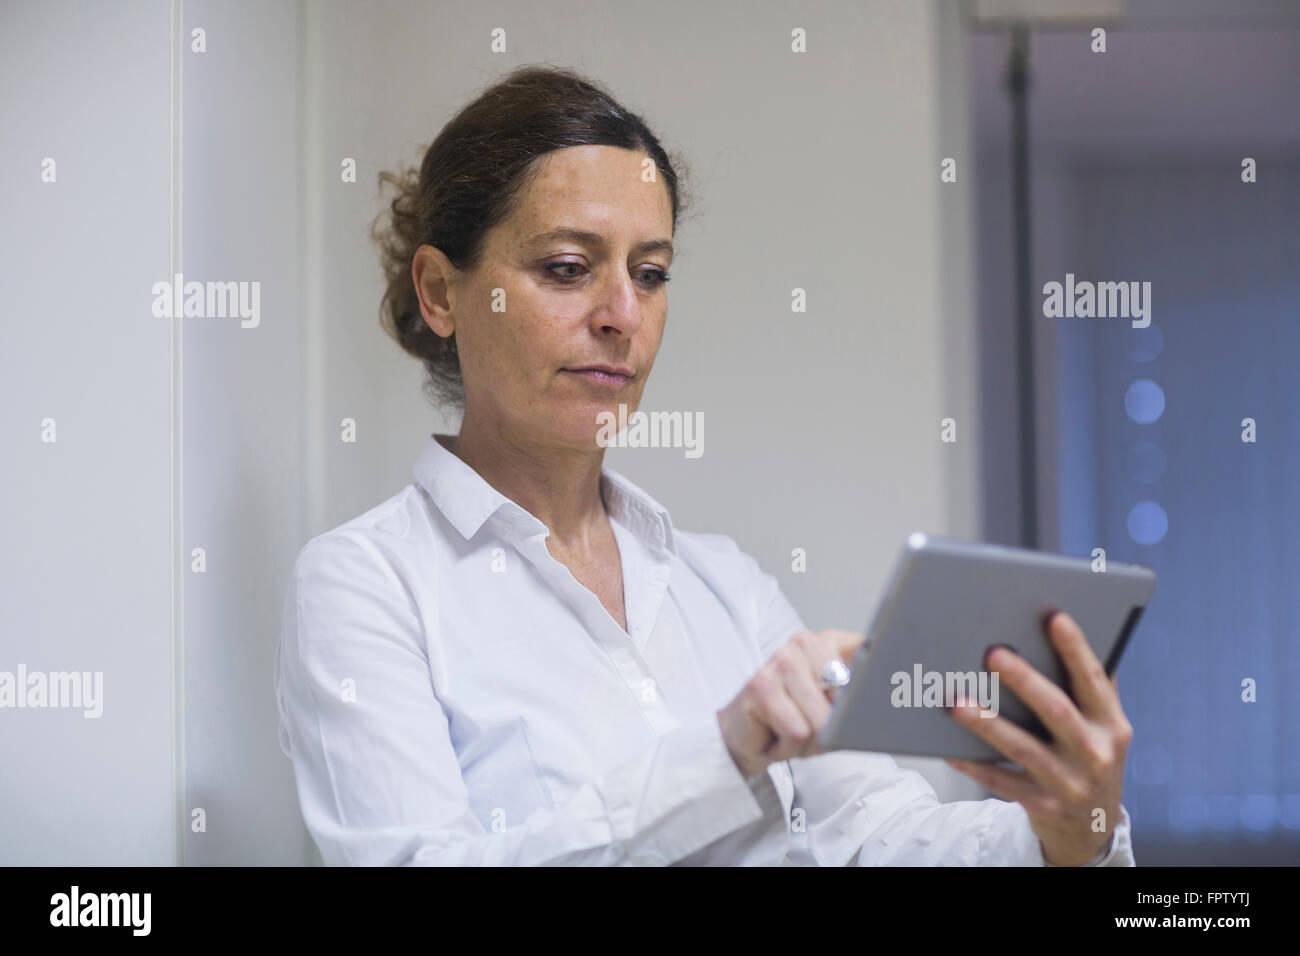 Female physiotherapist using a digital tablet, Freiburg Im Breisgau, Baden-Württemberg, Germany - Stock Image